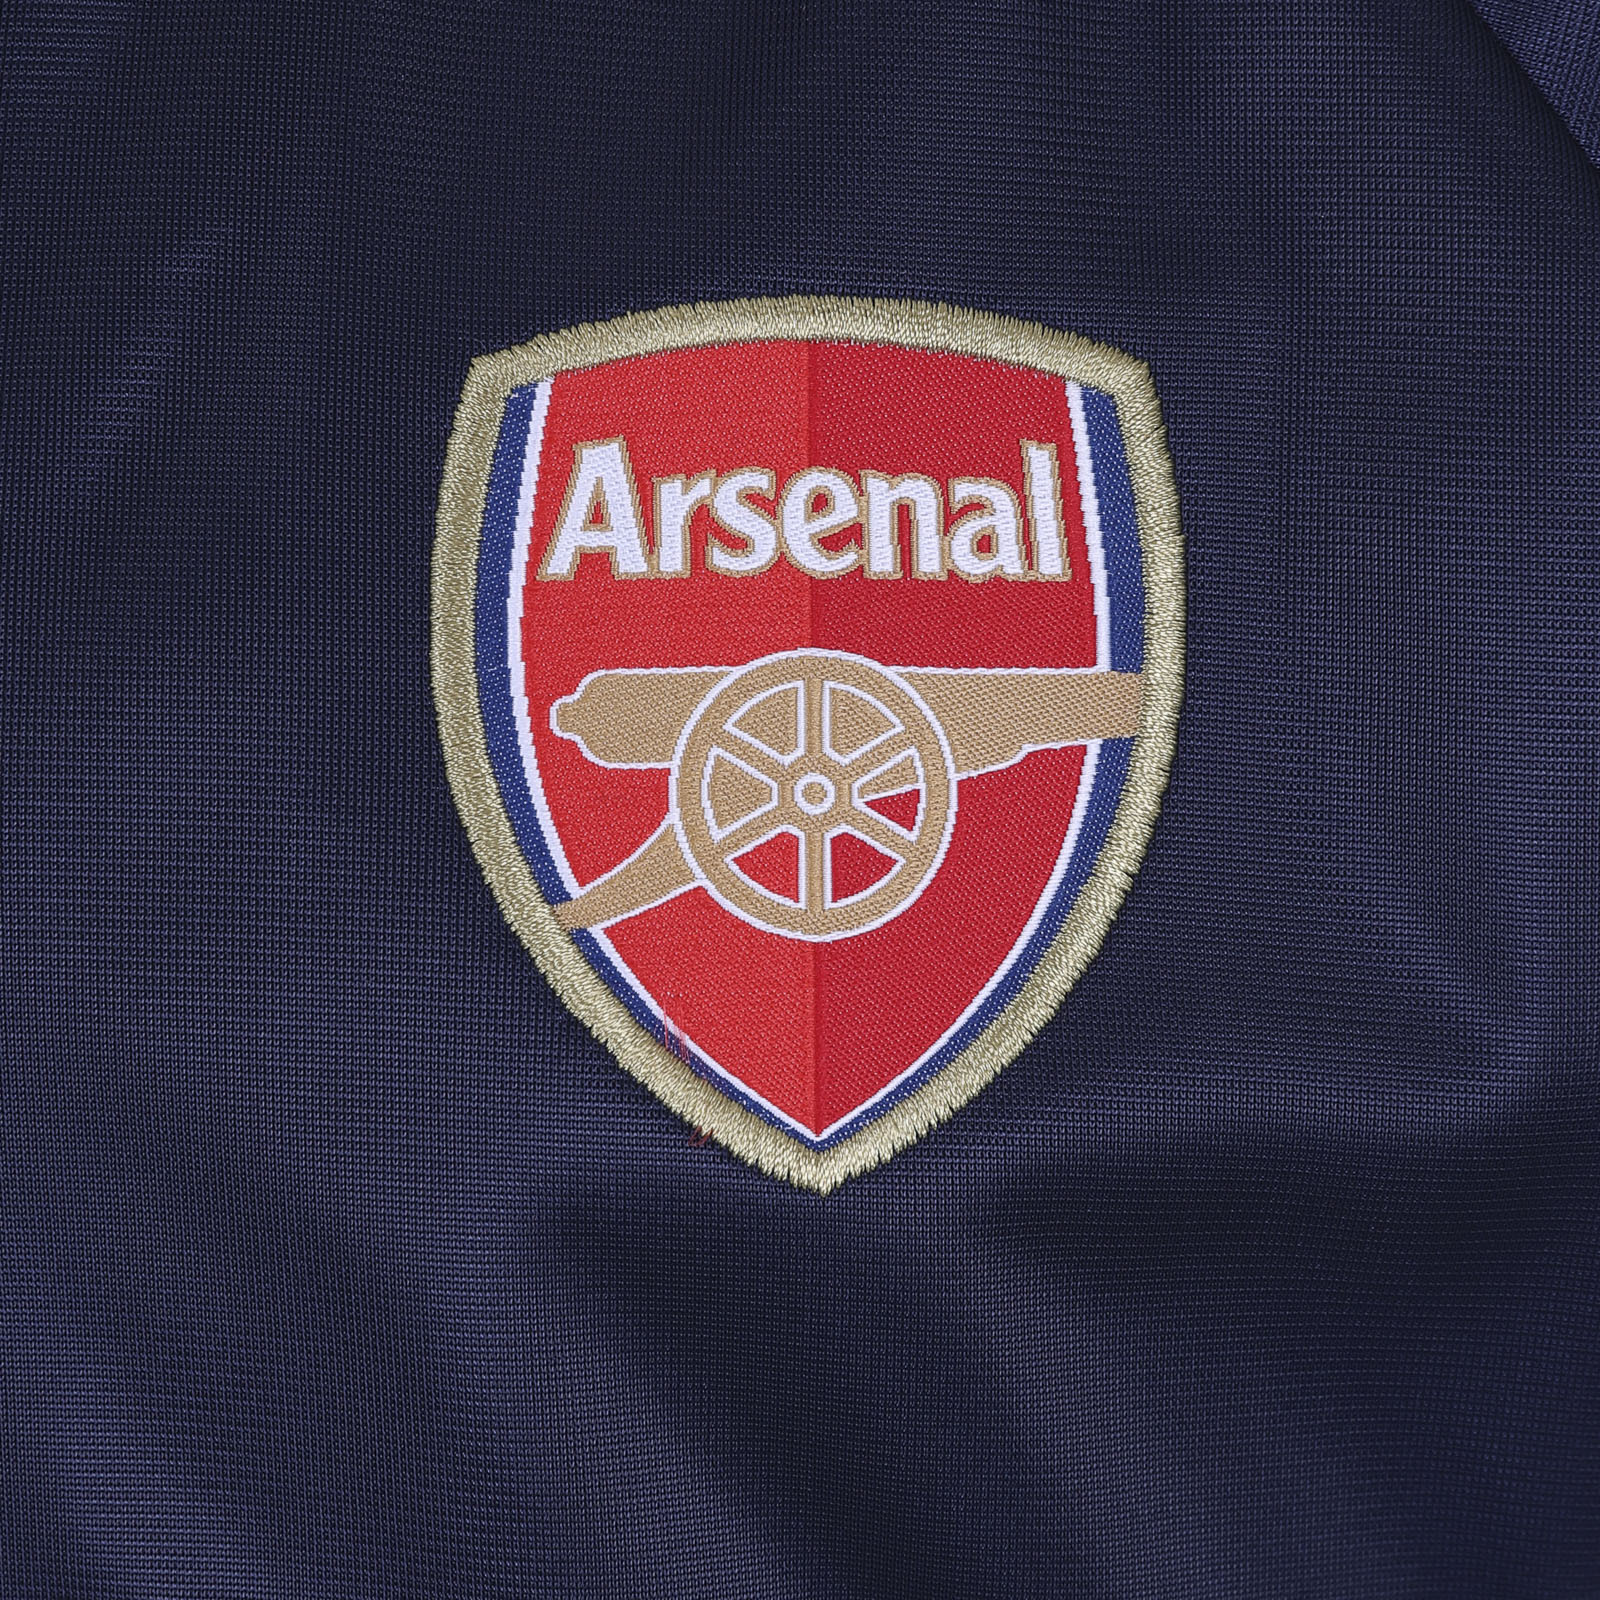 Arsenal-FC-Official-Football-Gift-Mens-Retro-Track-Top-Jacket 縮圖 4